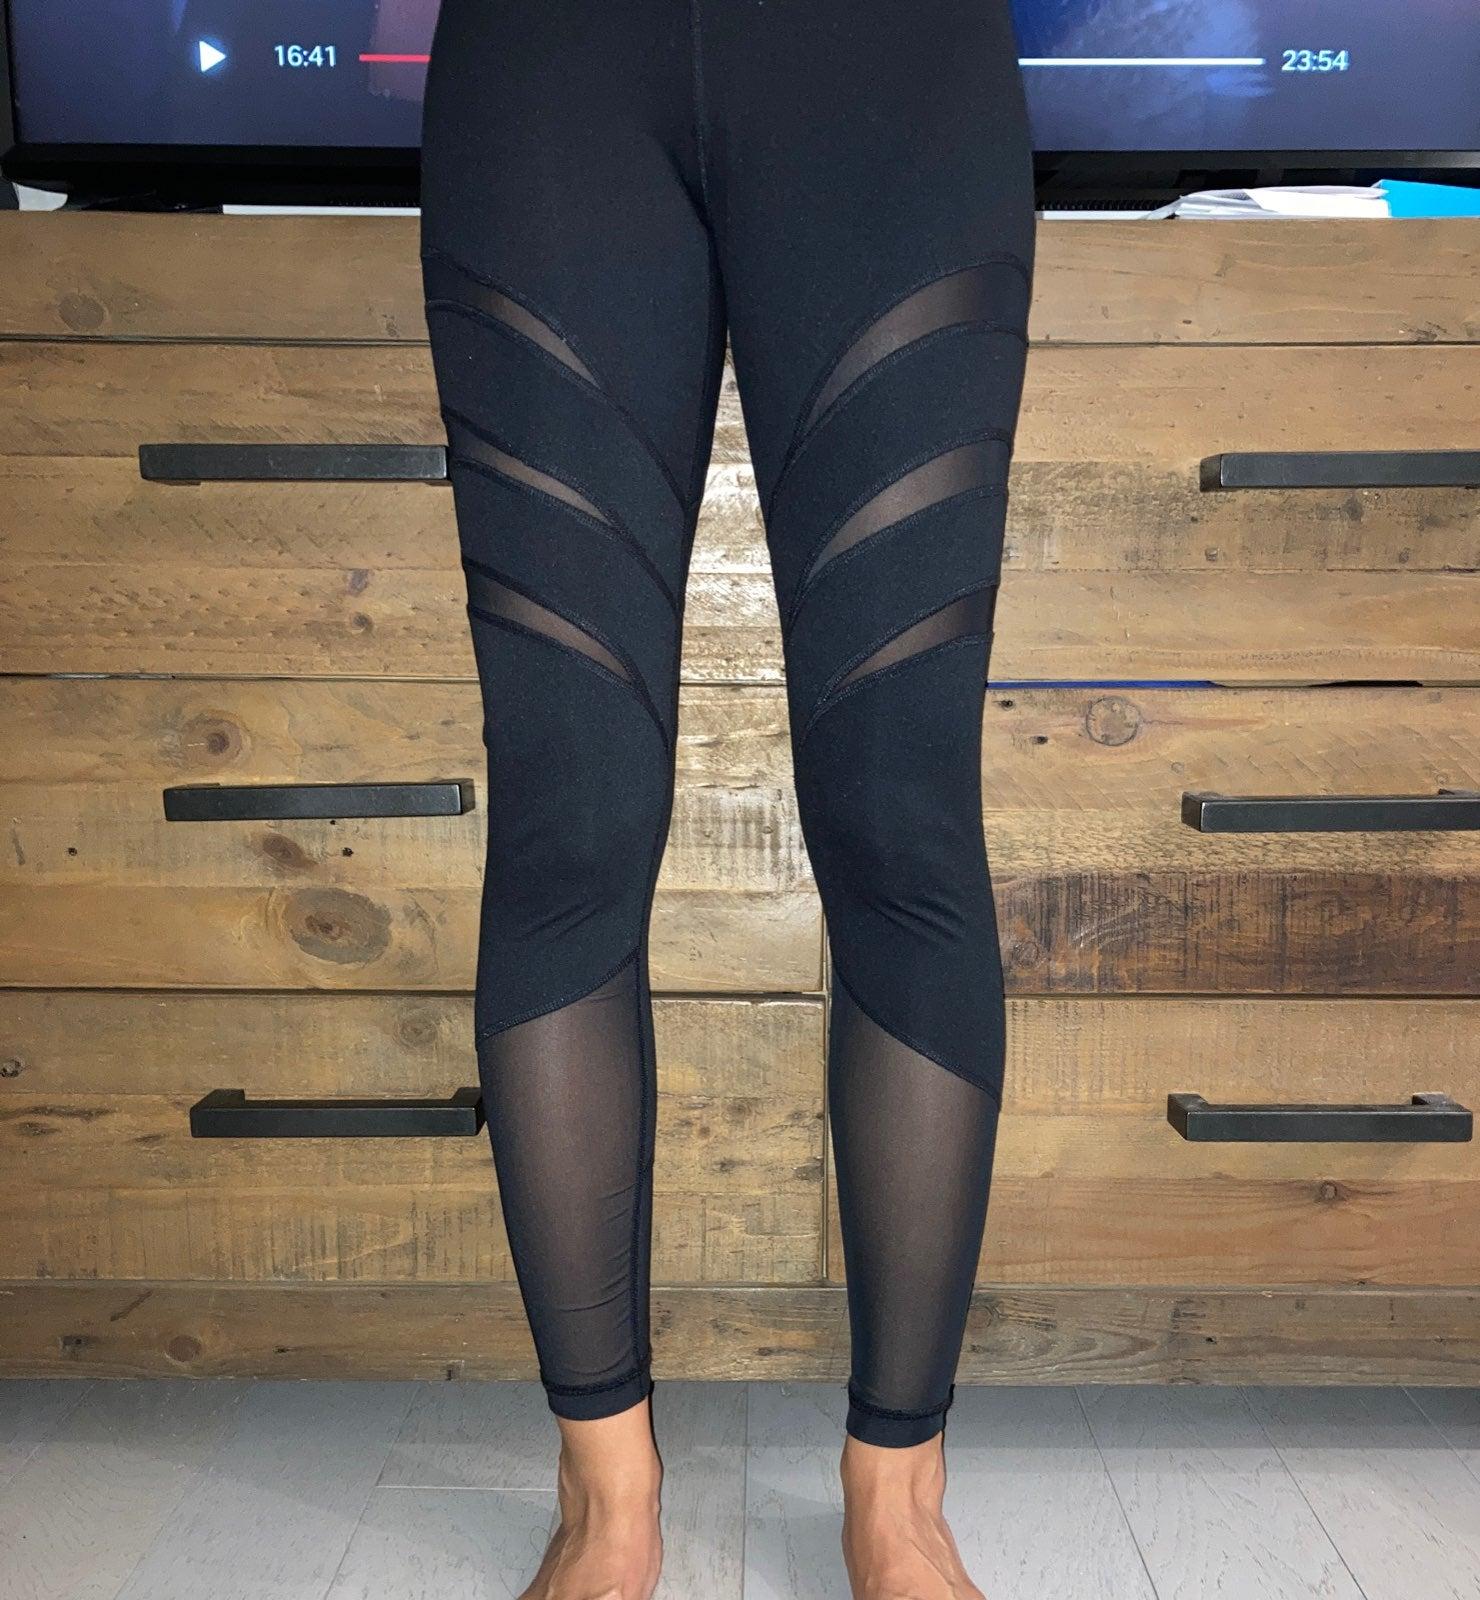 Black yogalicious Leggings